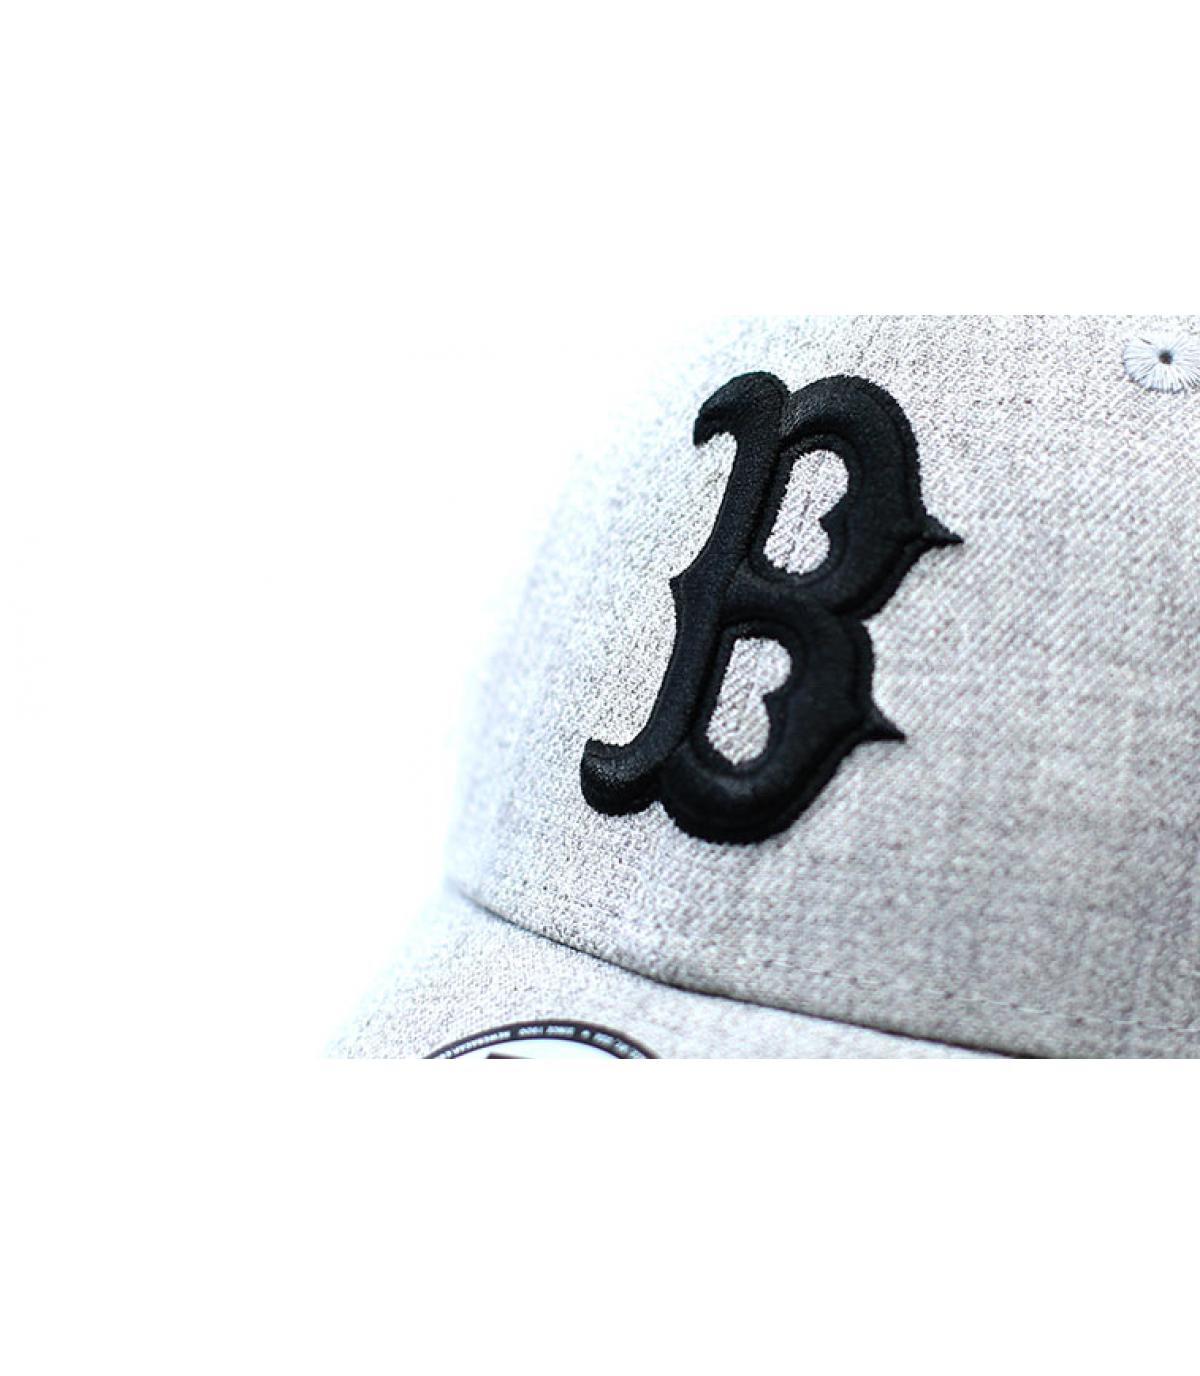 Dettagli Heather Ess Boston 9Forty gray black - image 3